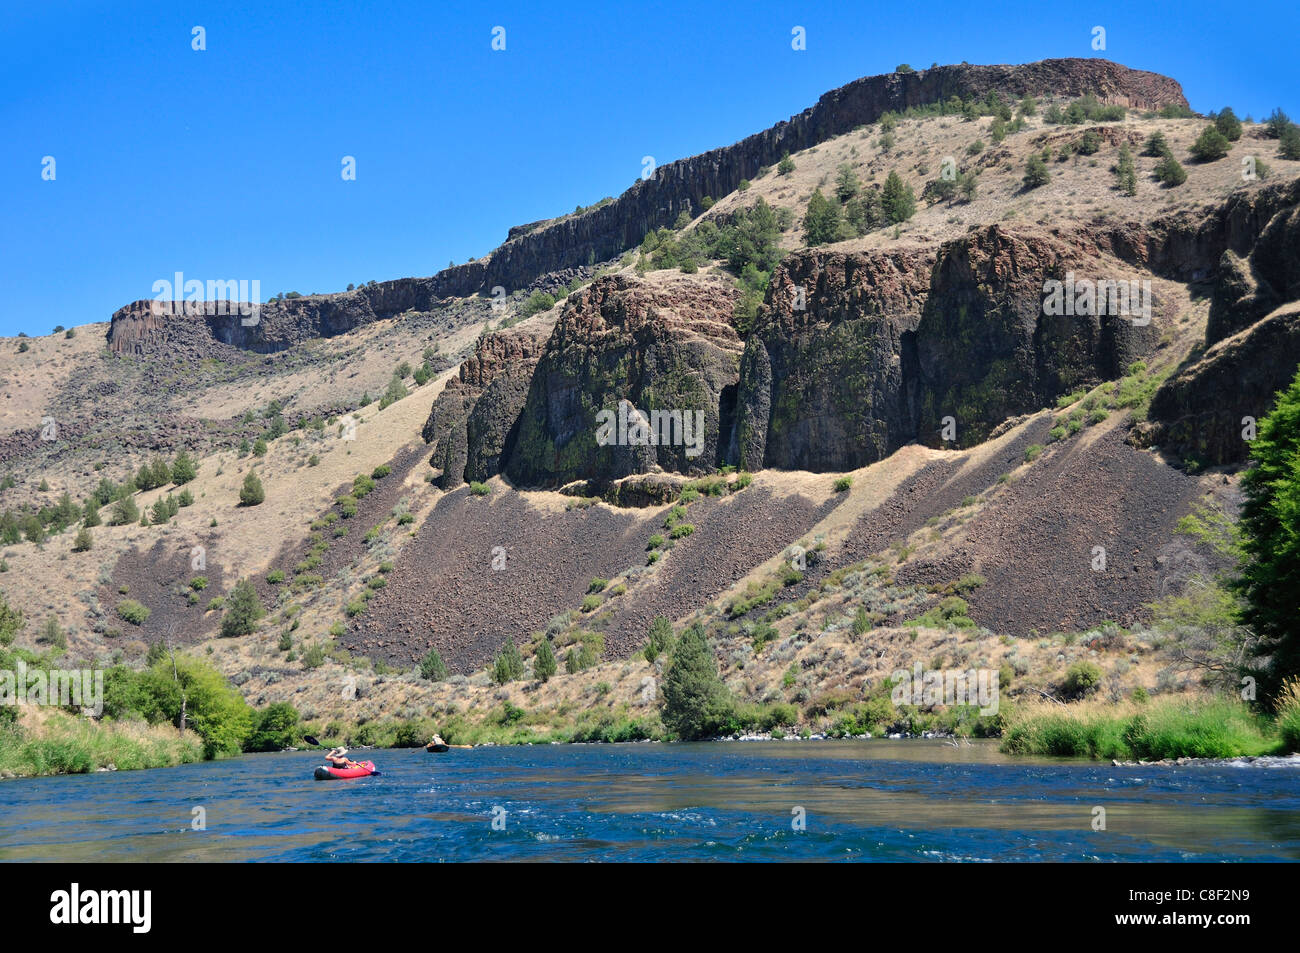 Inflatable, Kayaks, rafting, Deschutes, River, Central Oregon, Oregon, USA, United States, America, - Stock Image